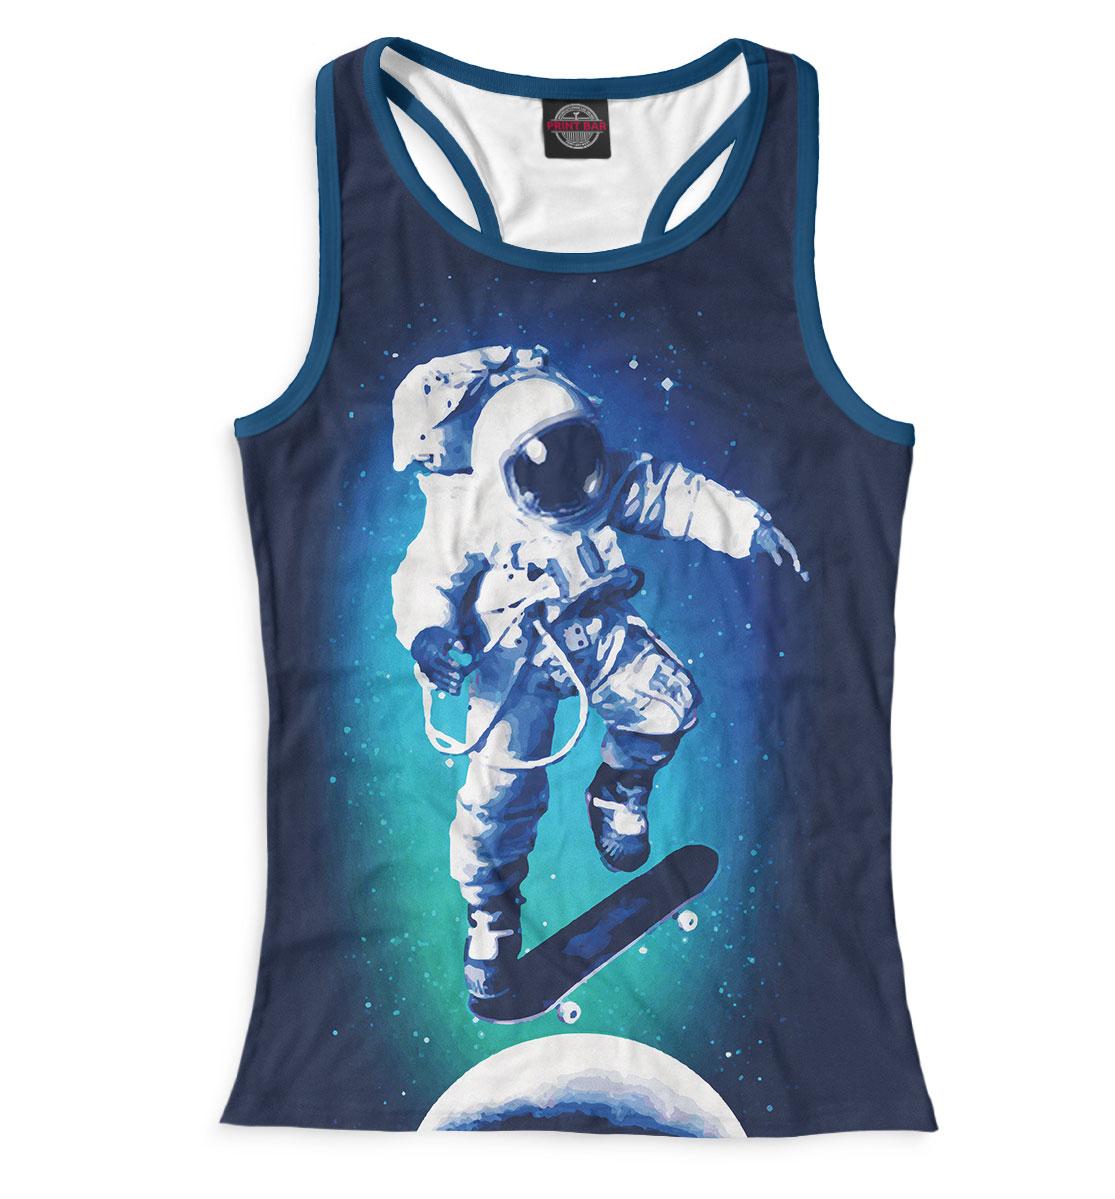 Купить Космонавт-скейтер, Printbar, Майки борцовки, SKT-954816-mayb-1